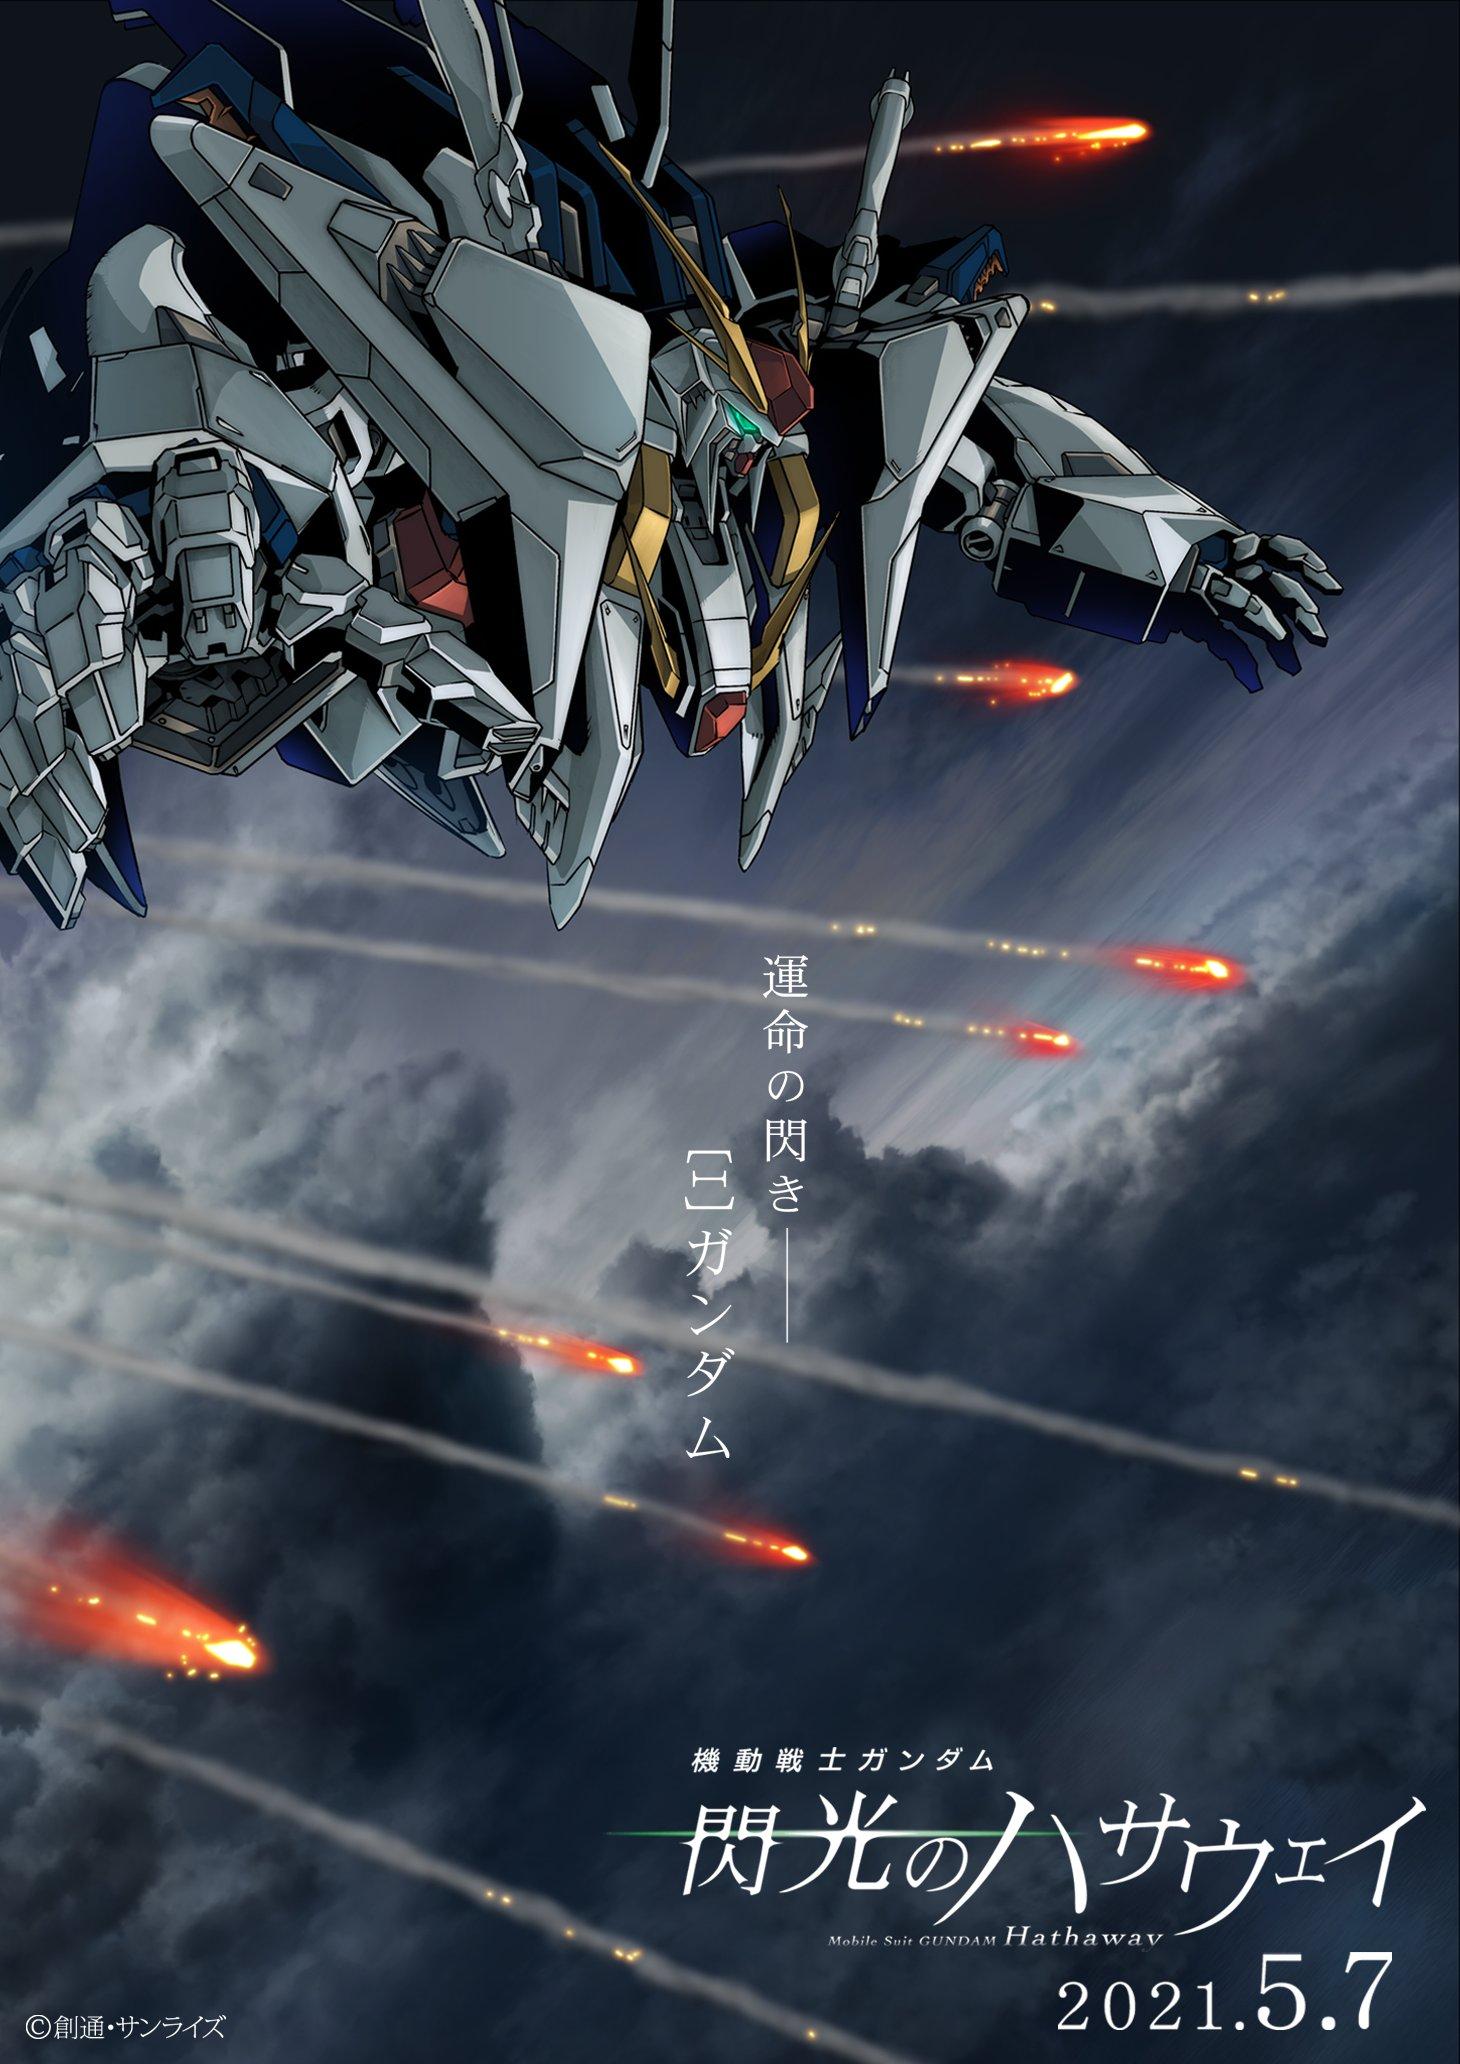 Mobile Suit Gundam Hathaway Affiche